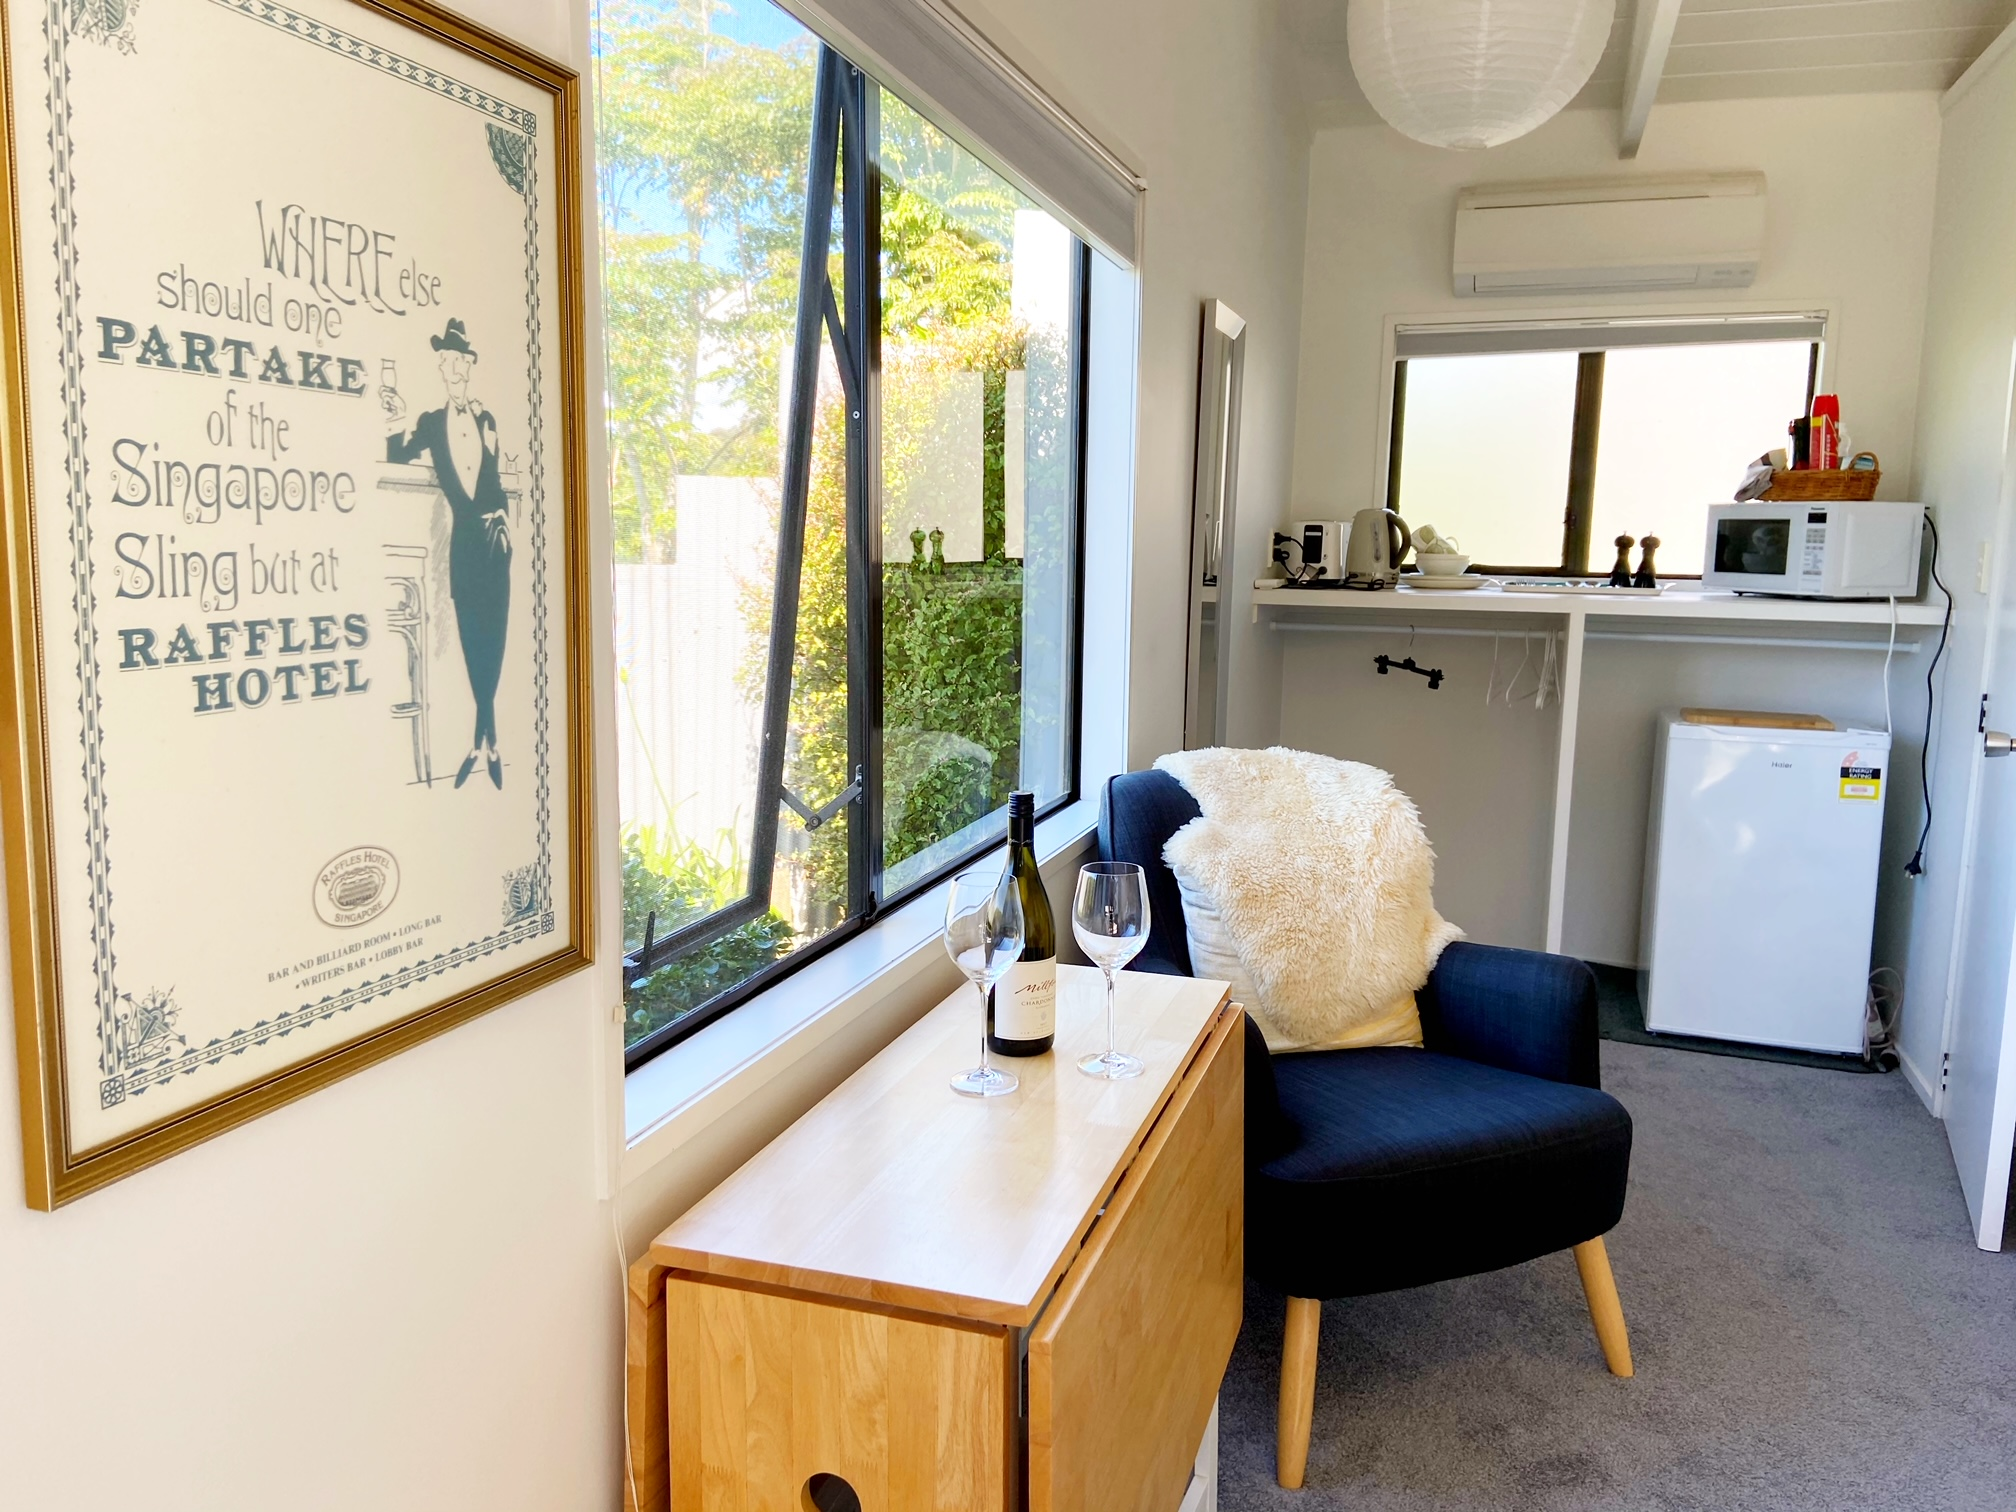 10.View-of-fridge-and-armchair.jpg